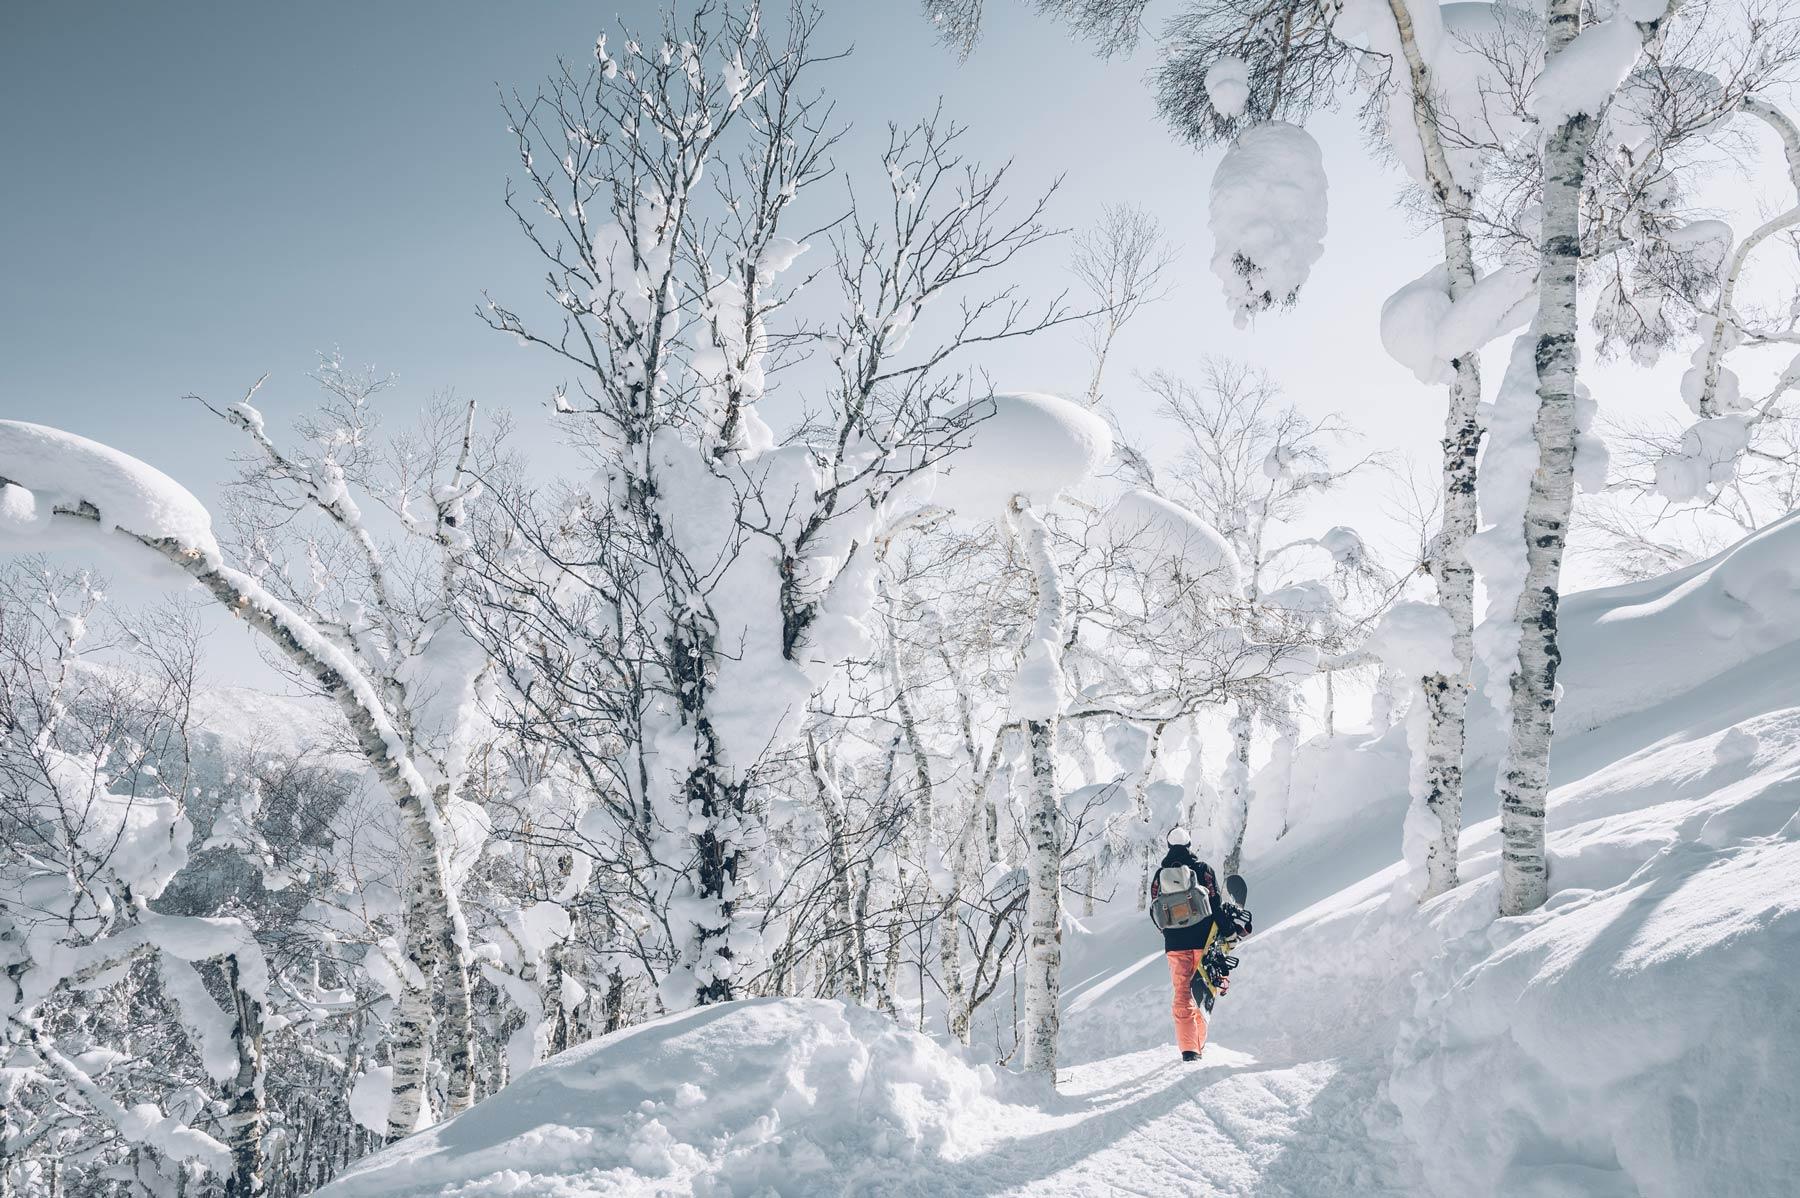 L'hiver au Japon, Hokkaido